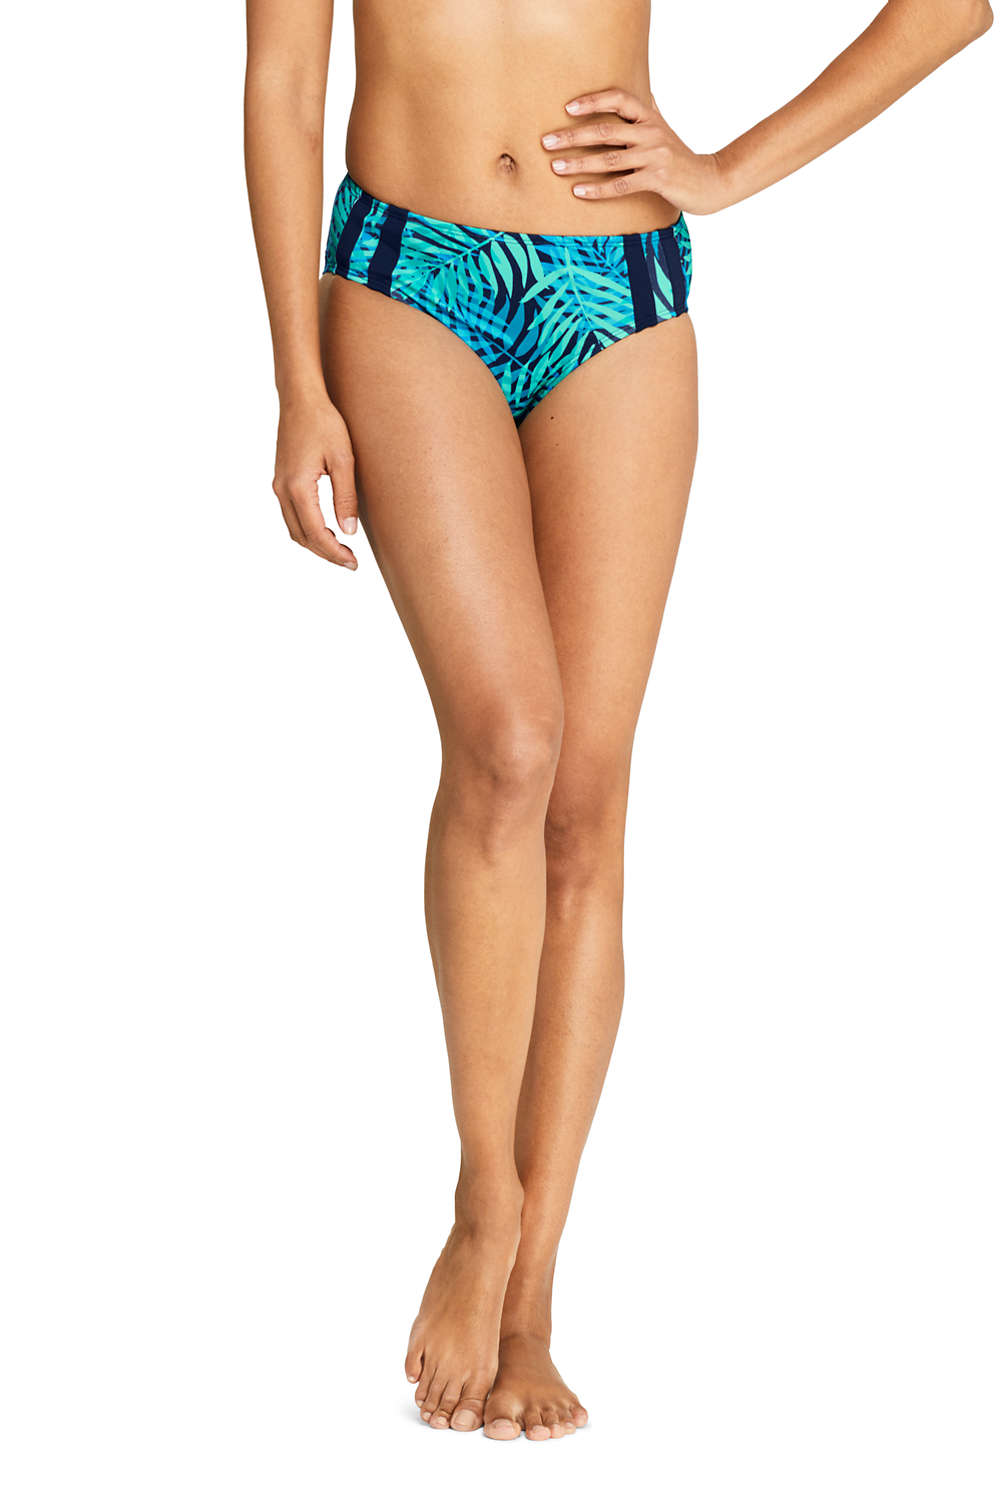 173d00f8cb2 Women's Chlorine Resistant Mid Waist Bikini Bottoms Print